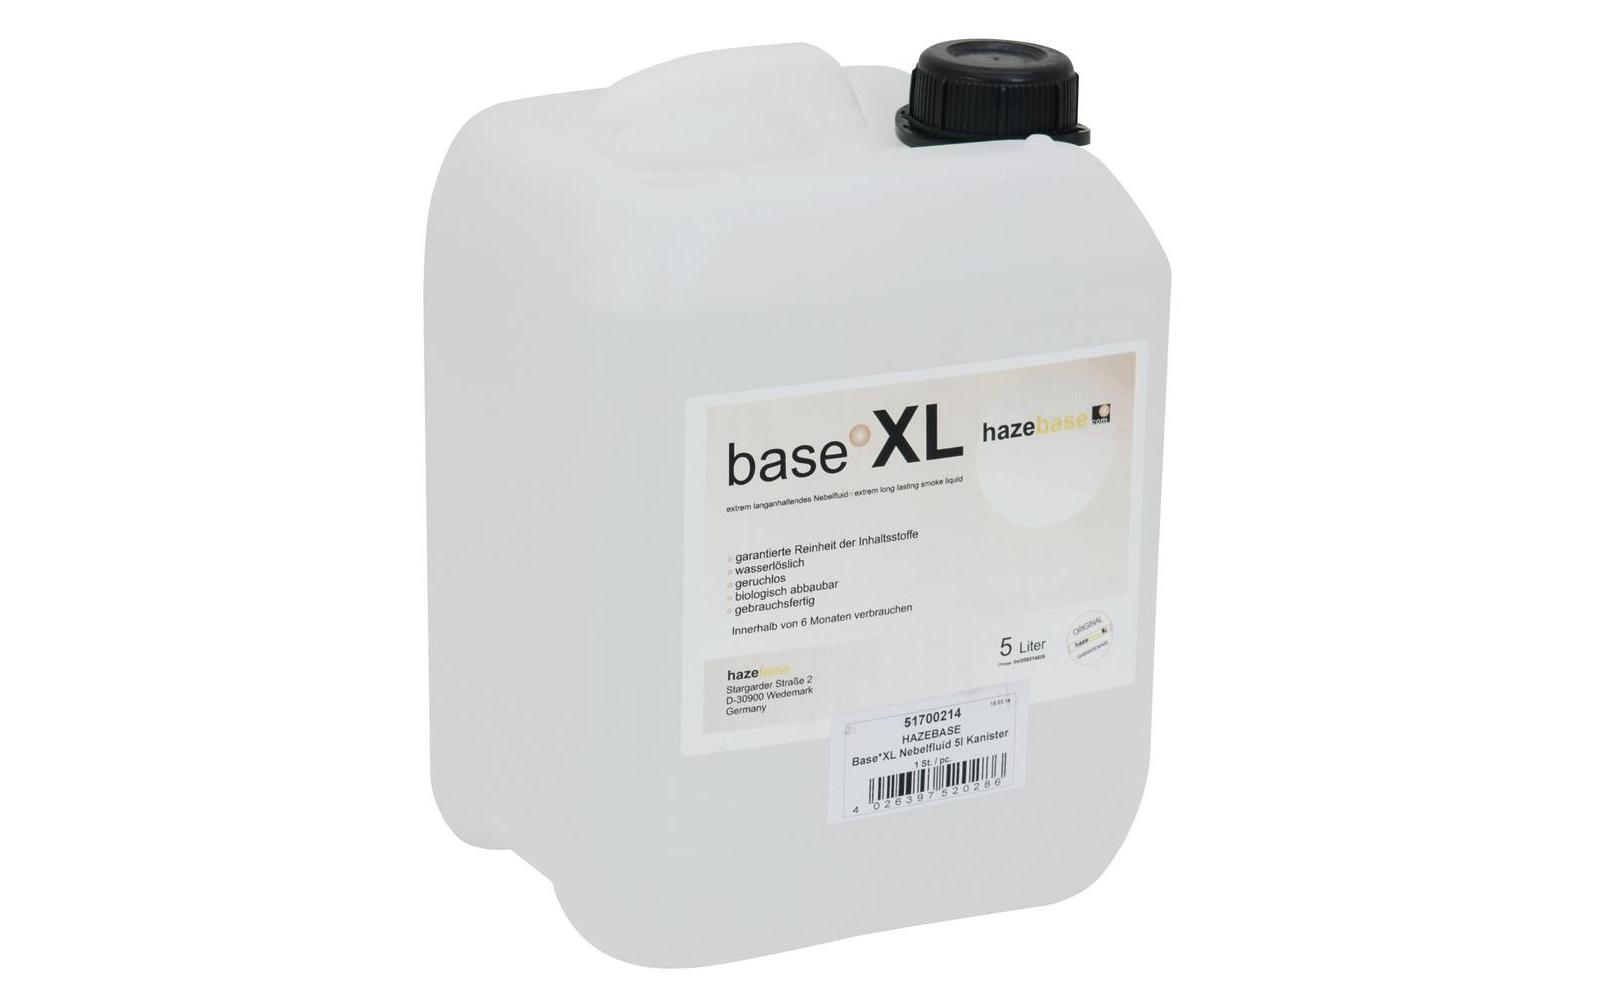 hazebase-base-xl-nebelfluid-25l-kanister